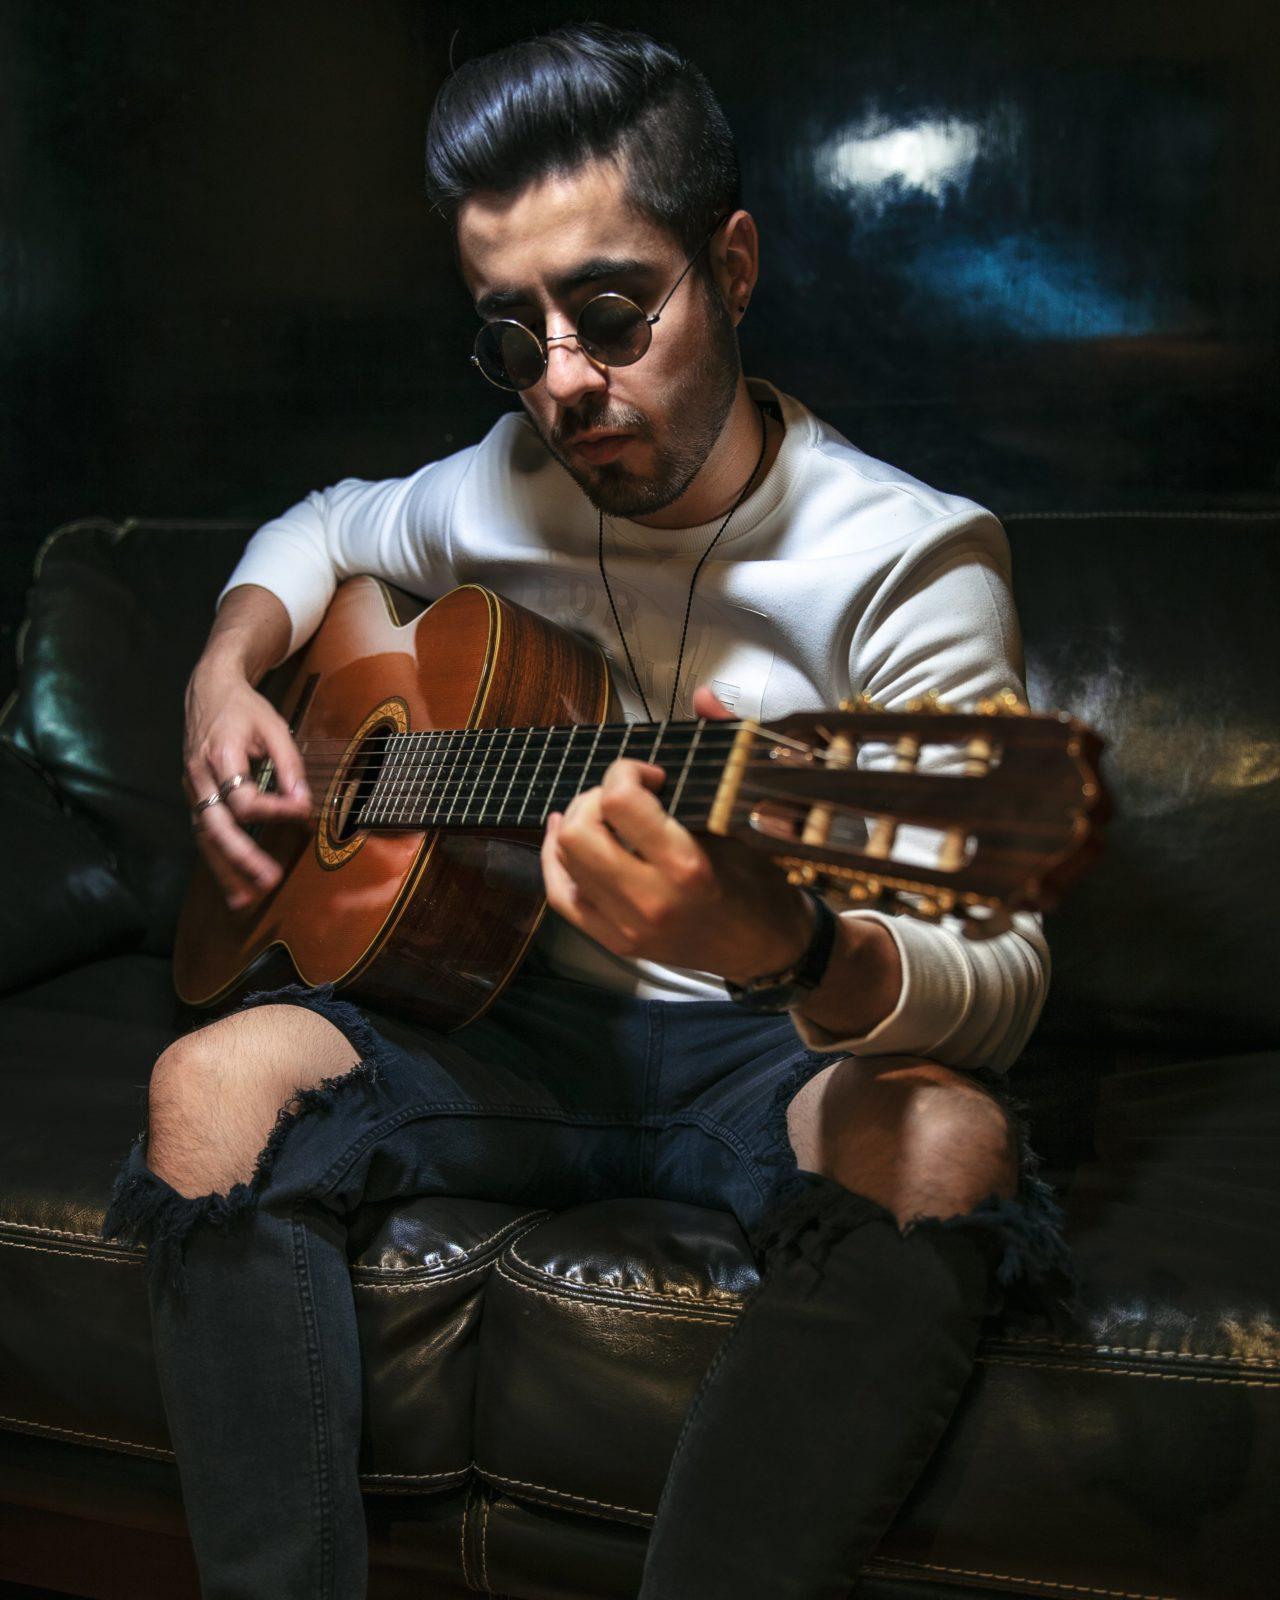 Foto-7-Sebastian-Castro-Musica-Musica-Sebastian_Castro-Pop-Urbana-Mexico-2020-Influencer-Artista-Cantante-Singer-min